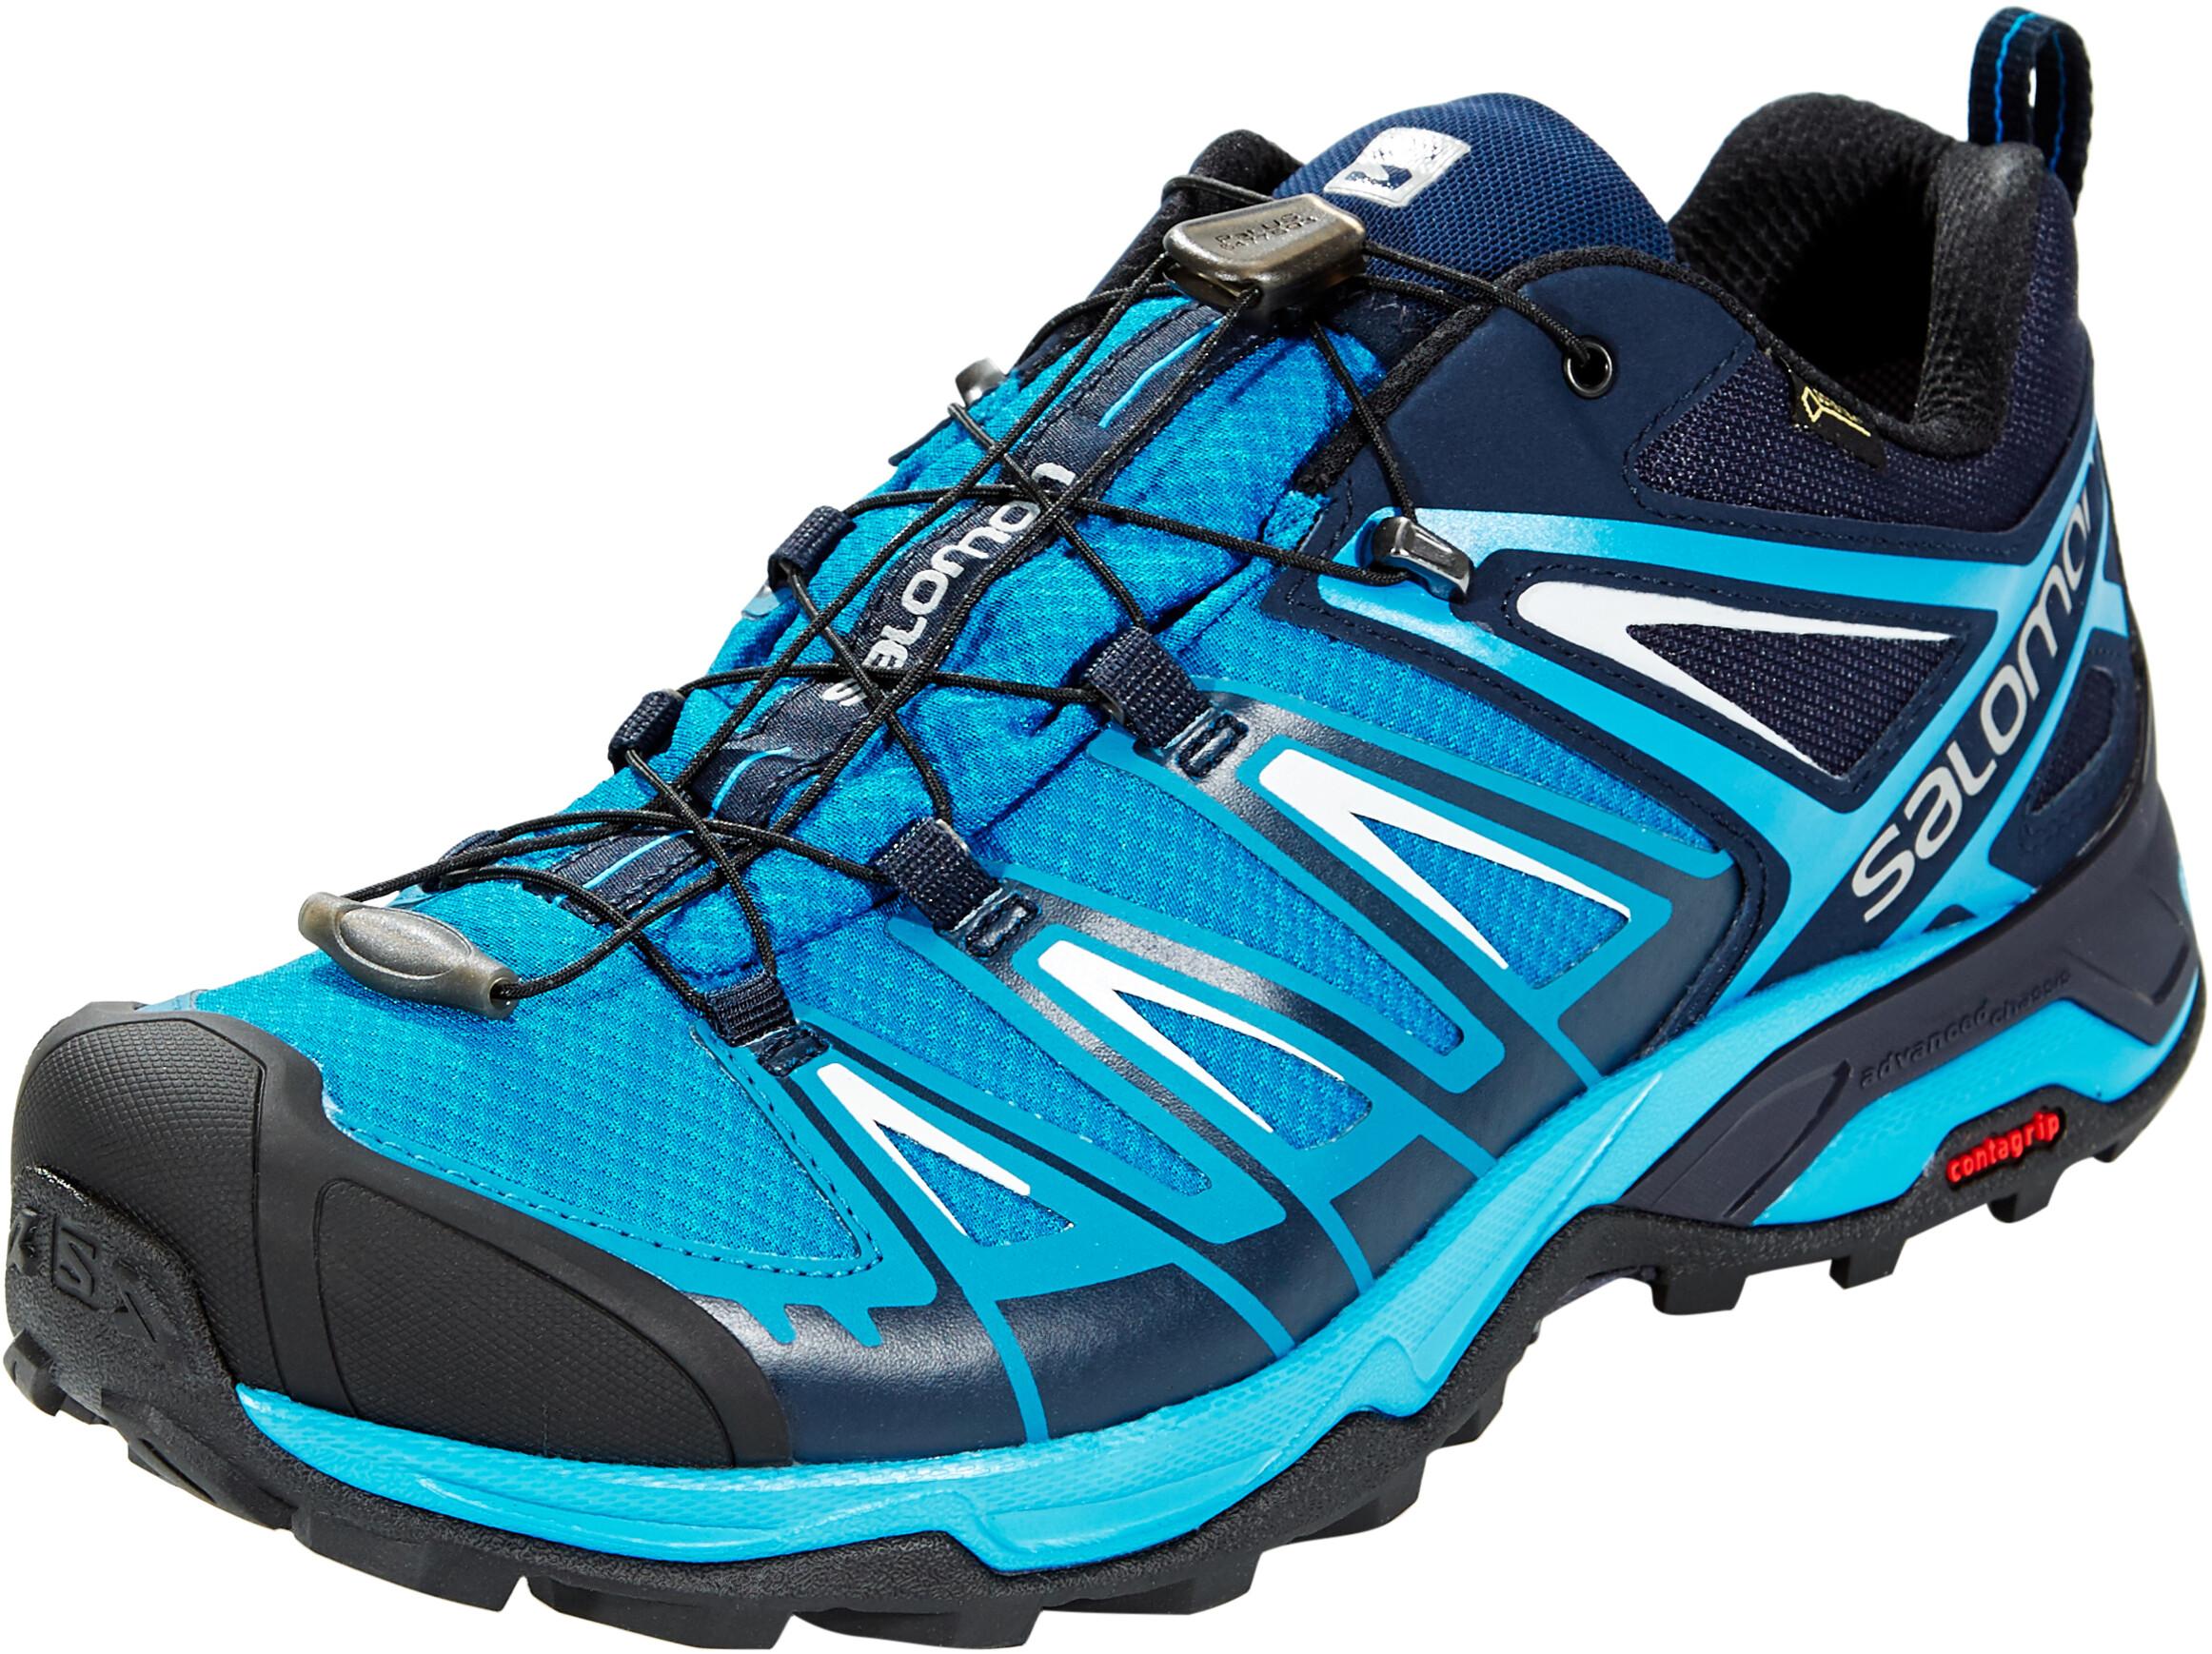 Salomon X Ultra 3 GTX Miehet kengät  afd0dd65f3